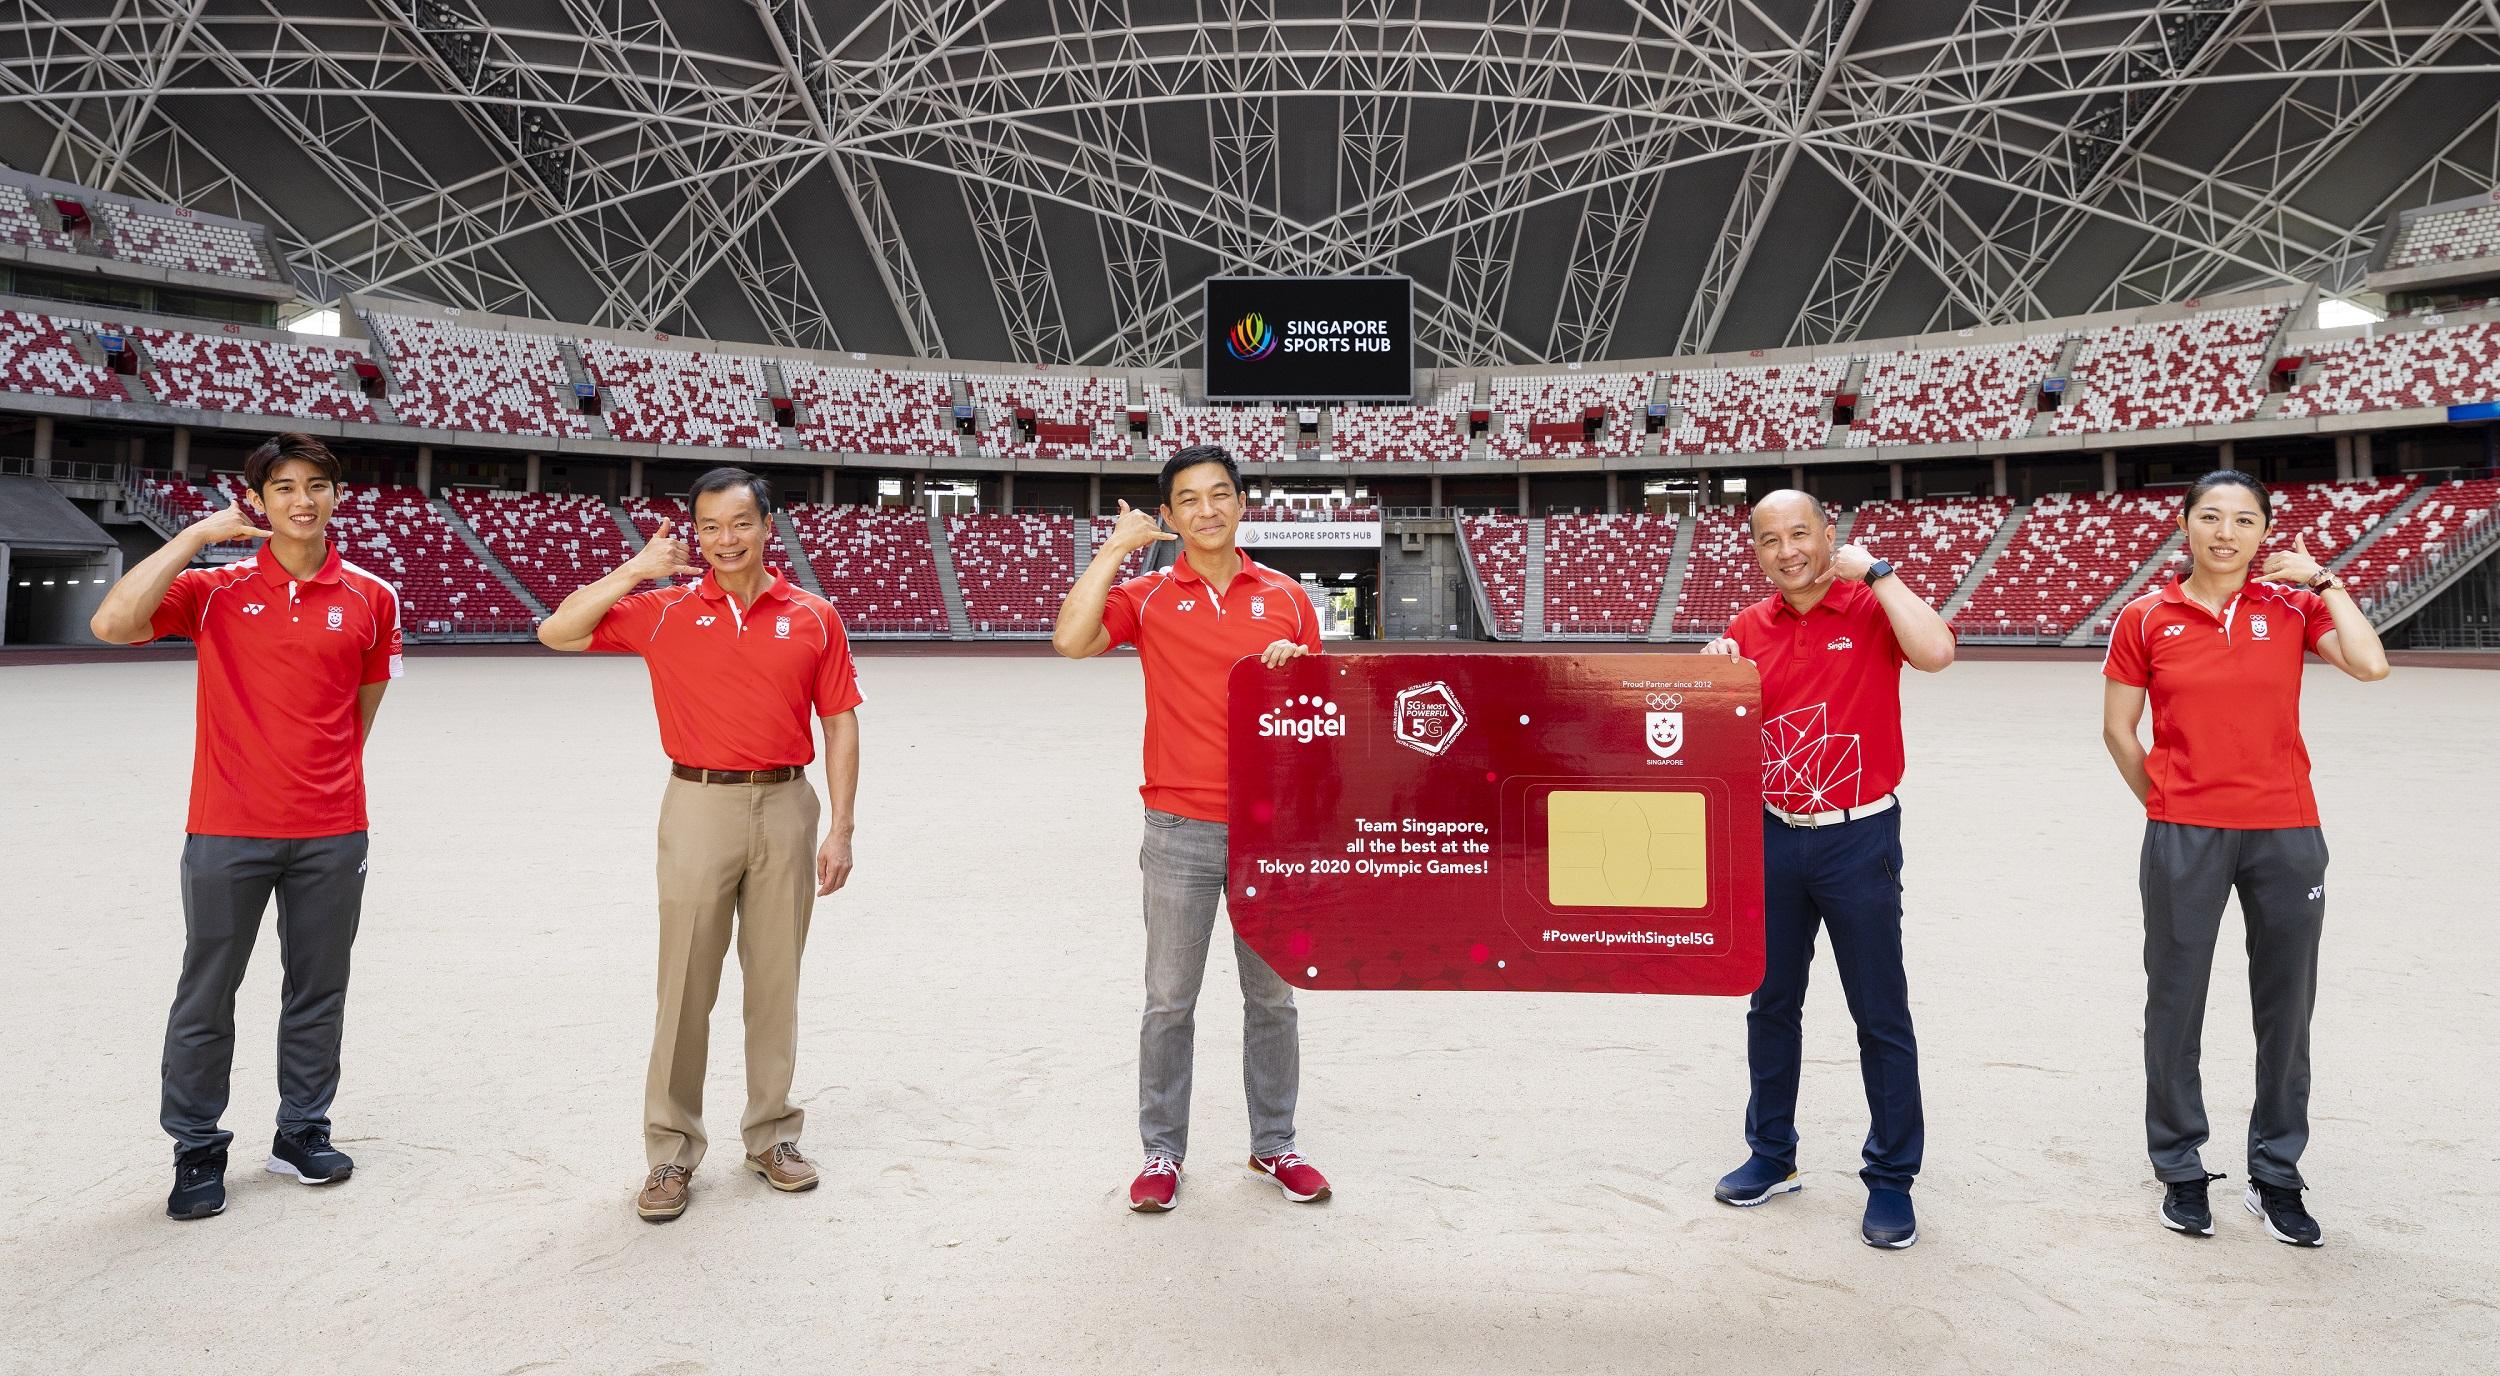 Team Singapore Athlete and Singtel CEO